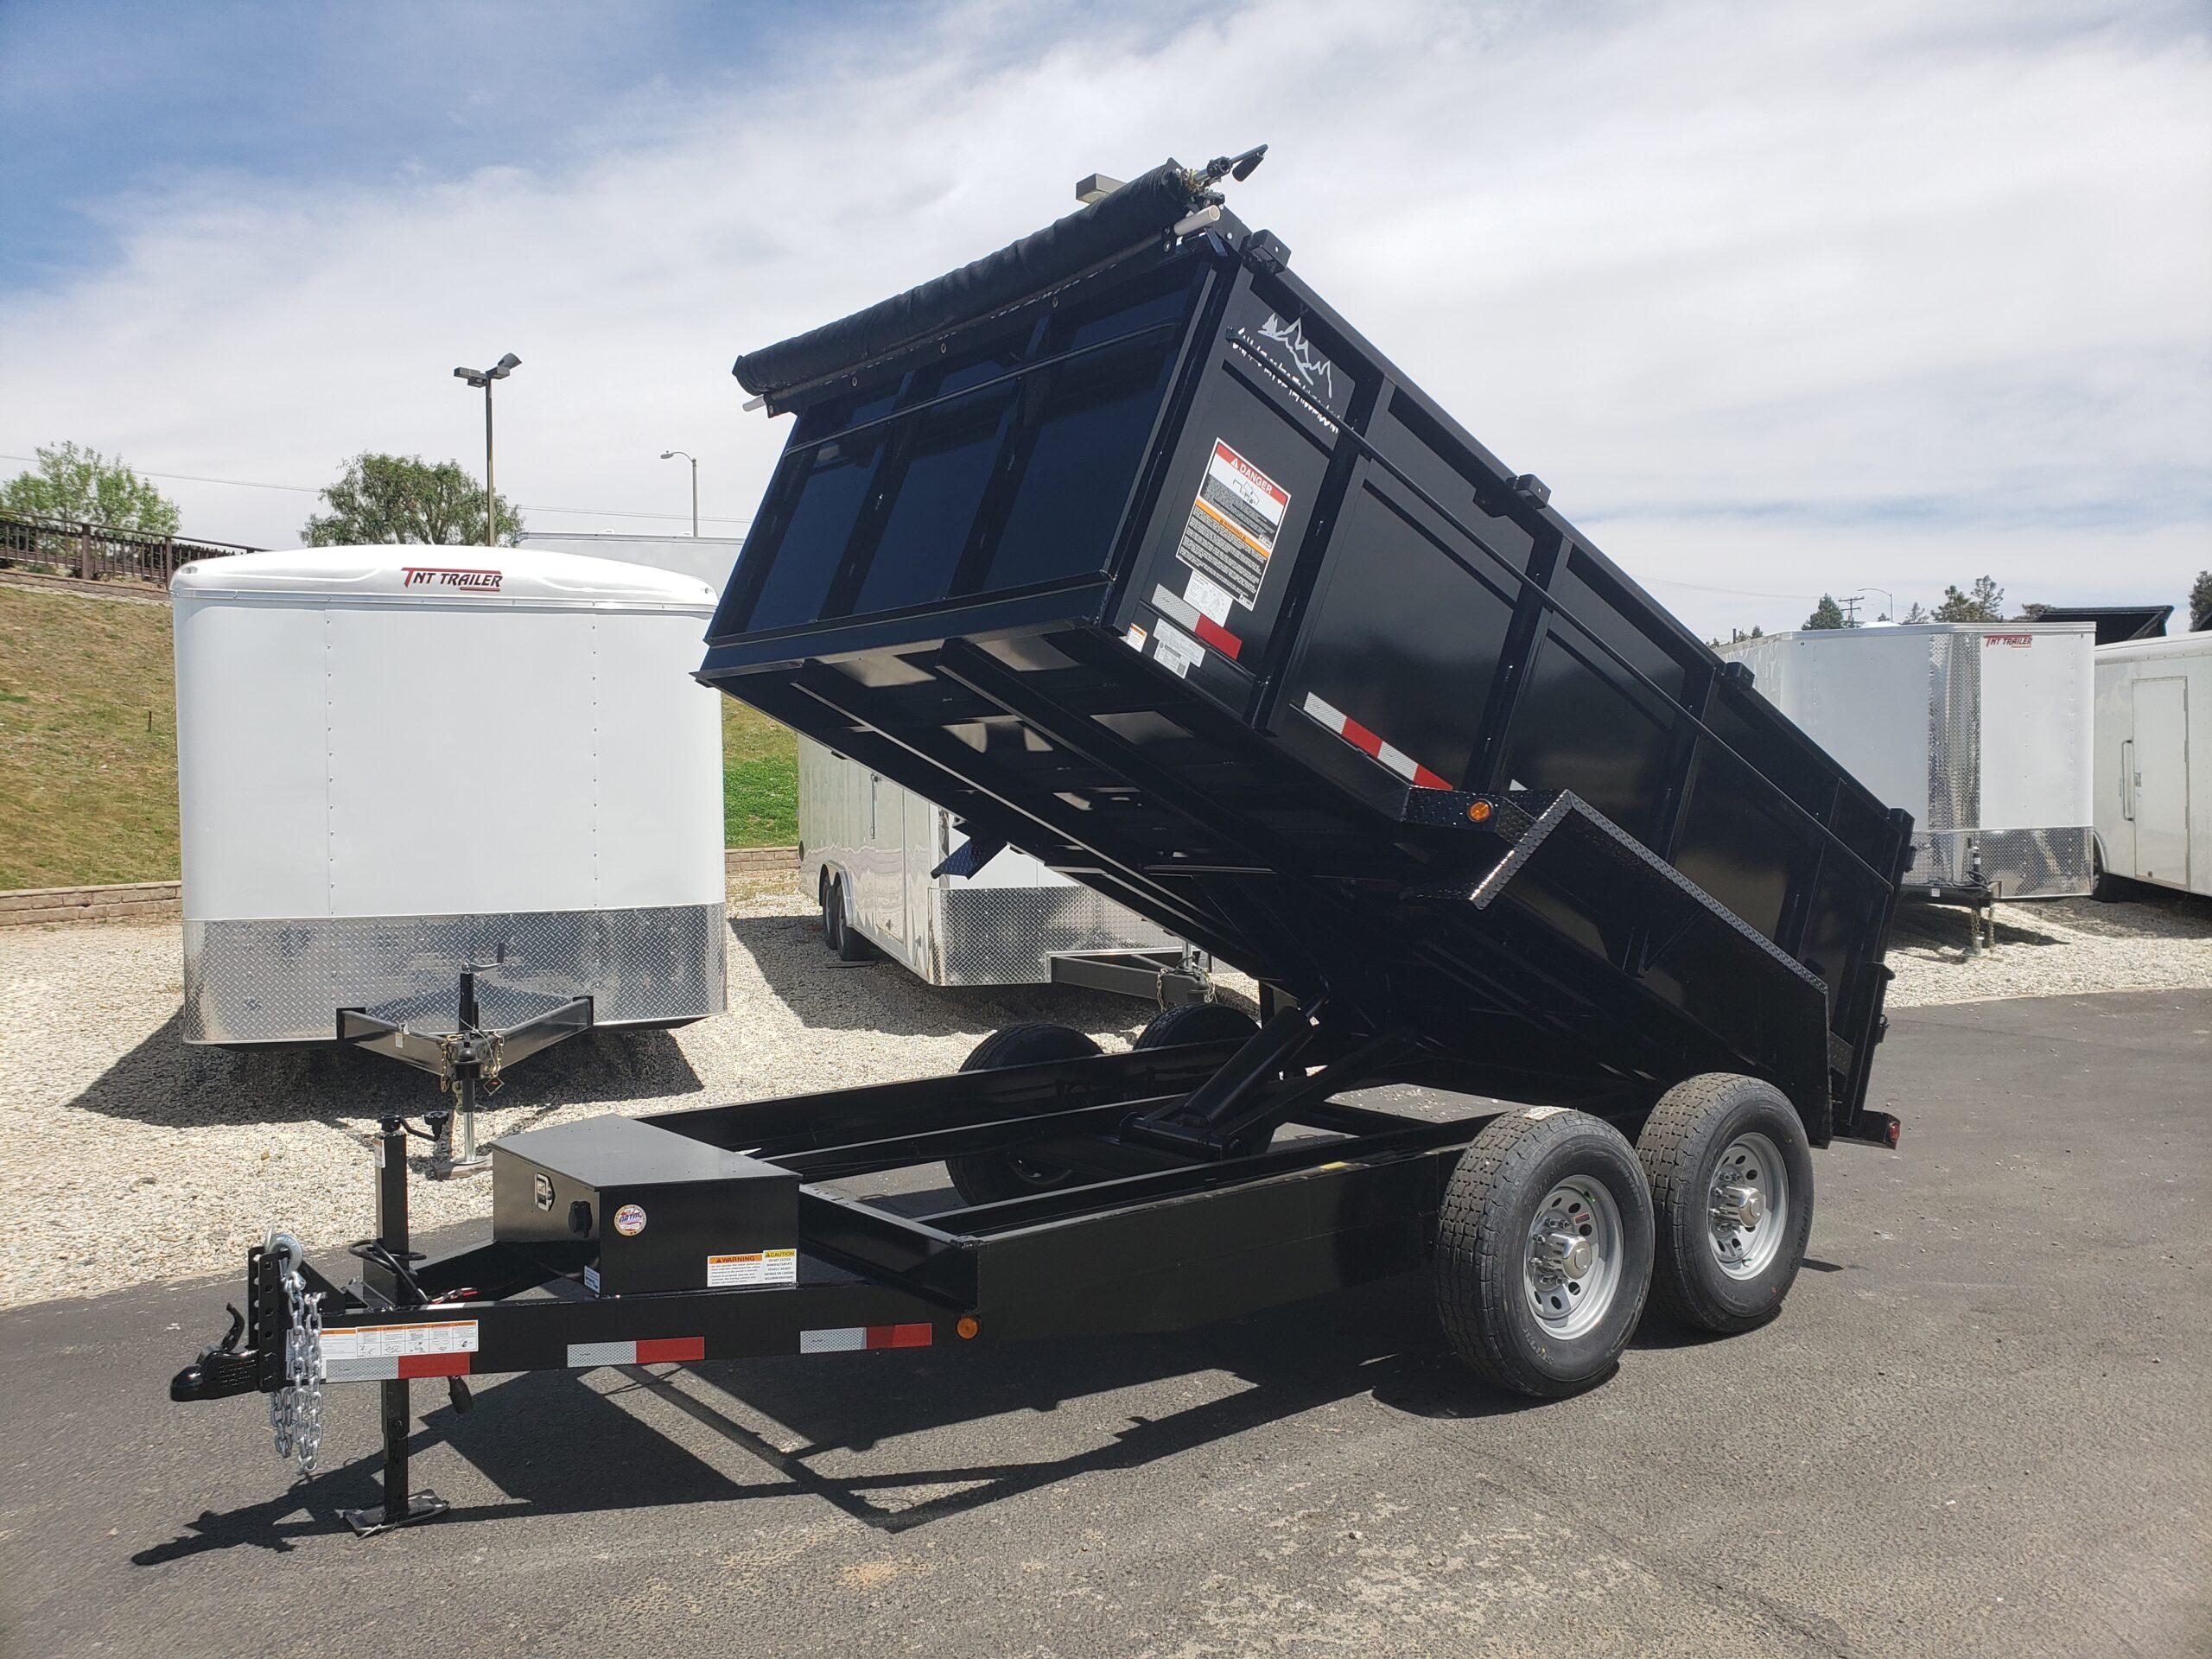 Snake River 7x12 Dump 3ft - Driver side front 3/4 view bed dumped